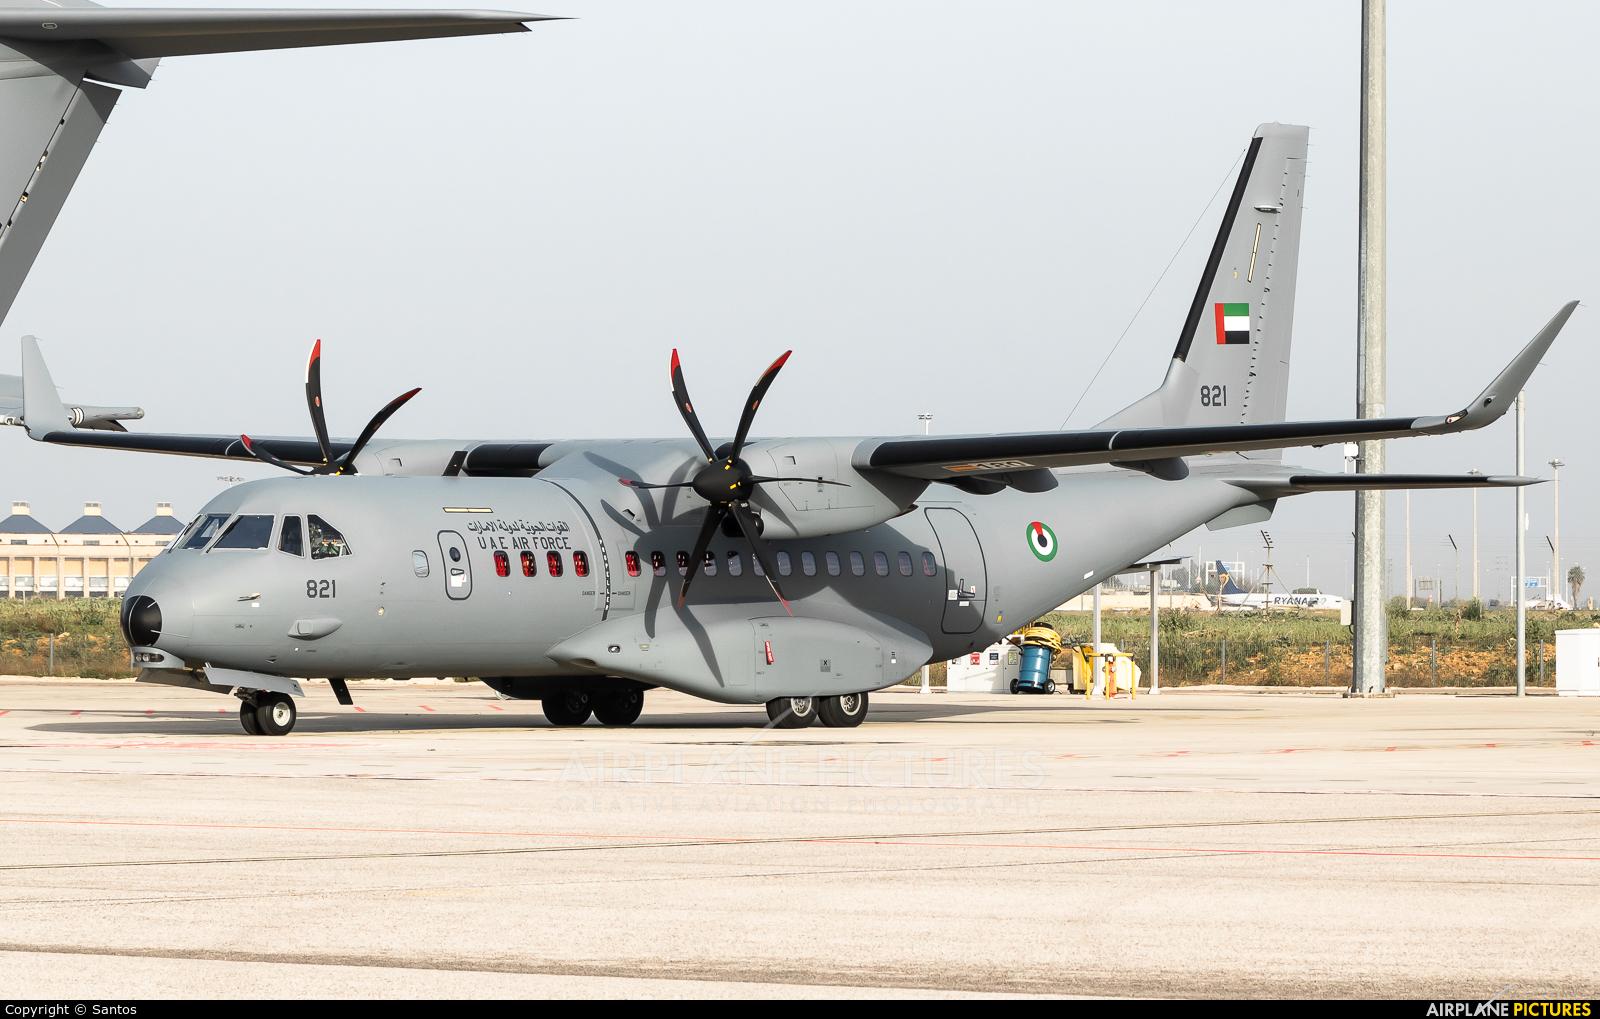 United Arab Emirates - Air Force 821 aircraft at Seville - San Pablo